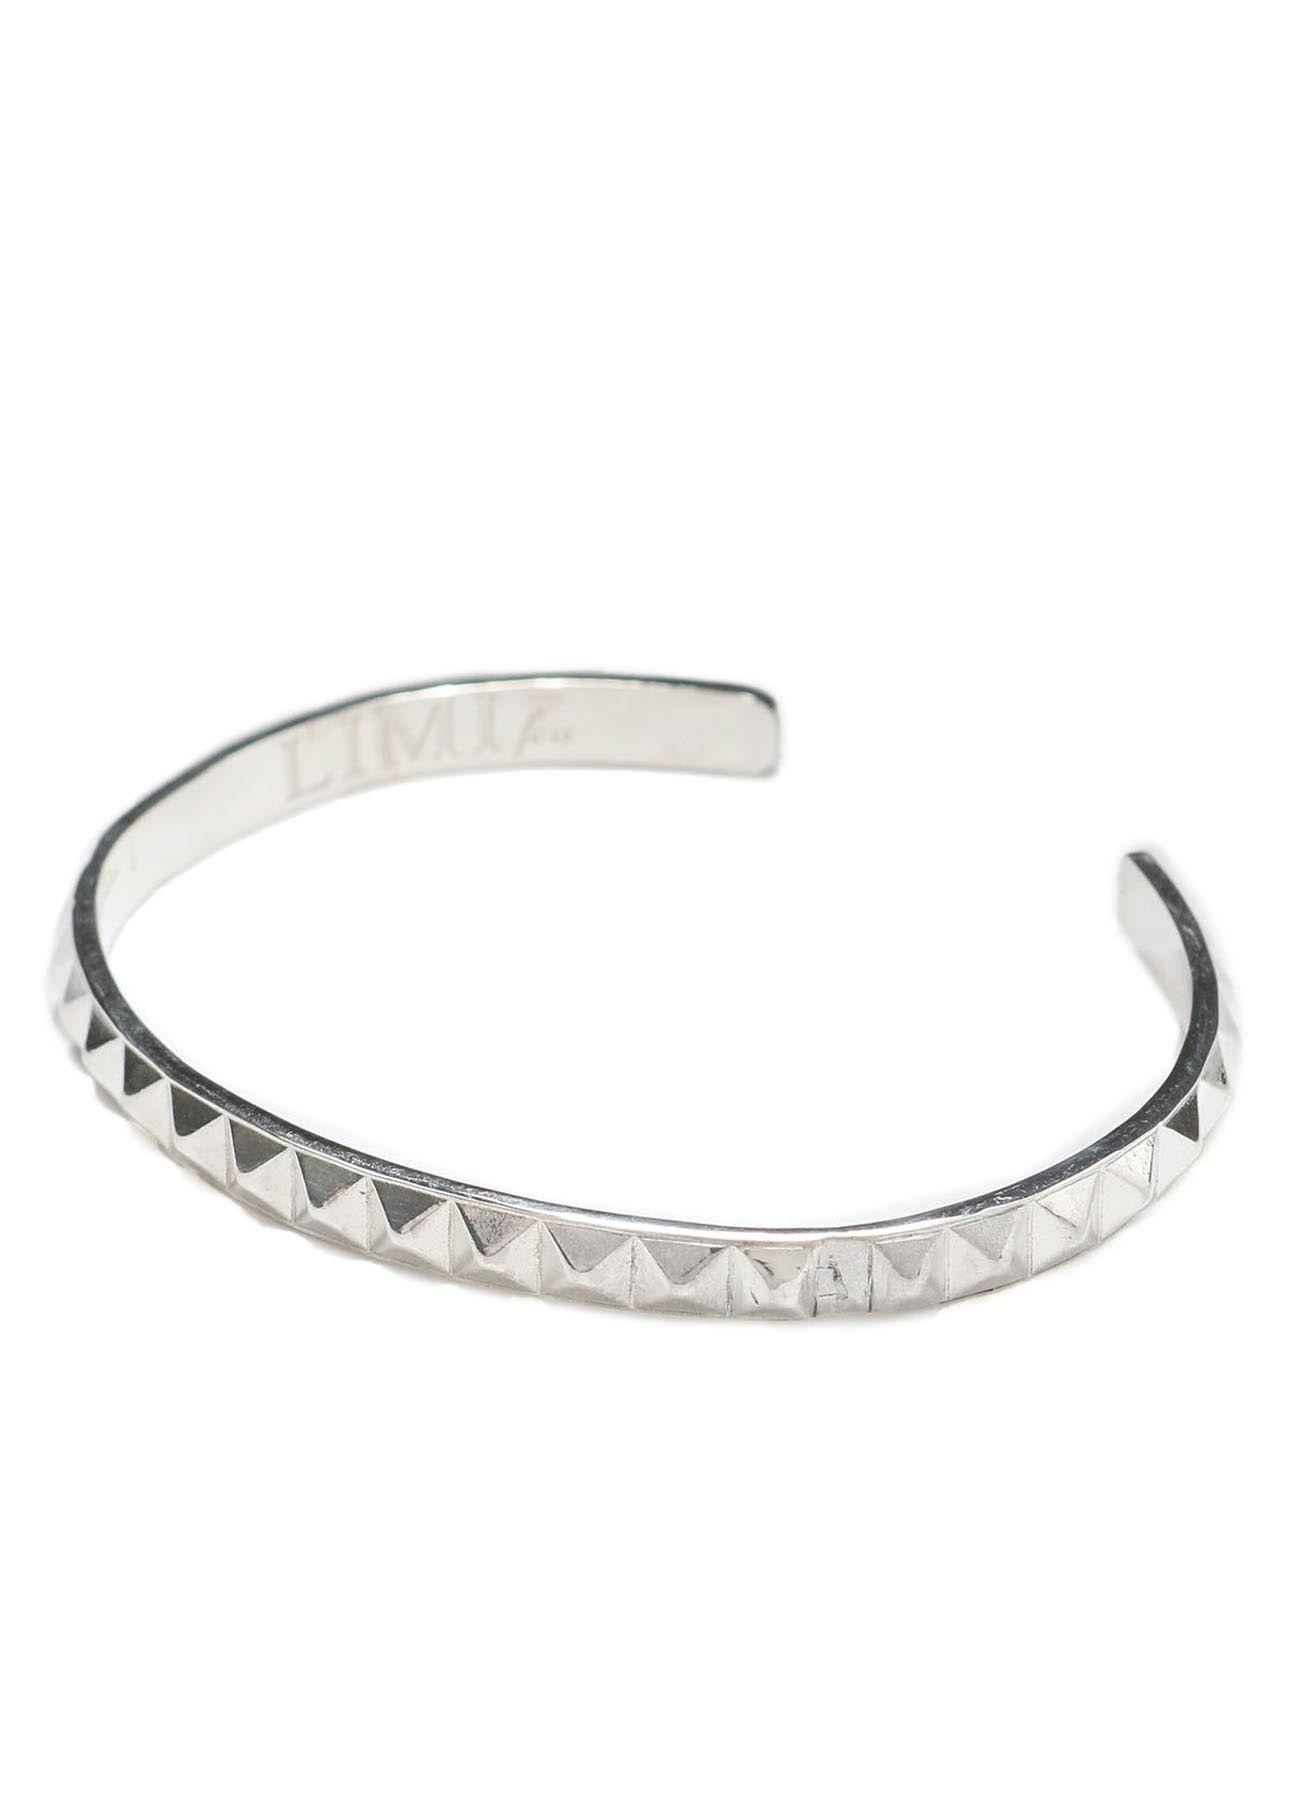 Silver 925 Bangle A